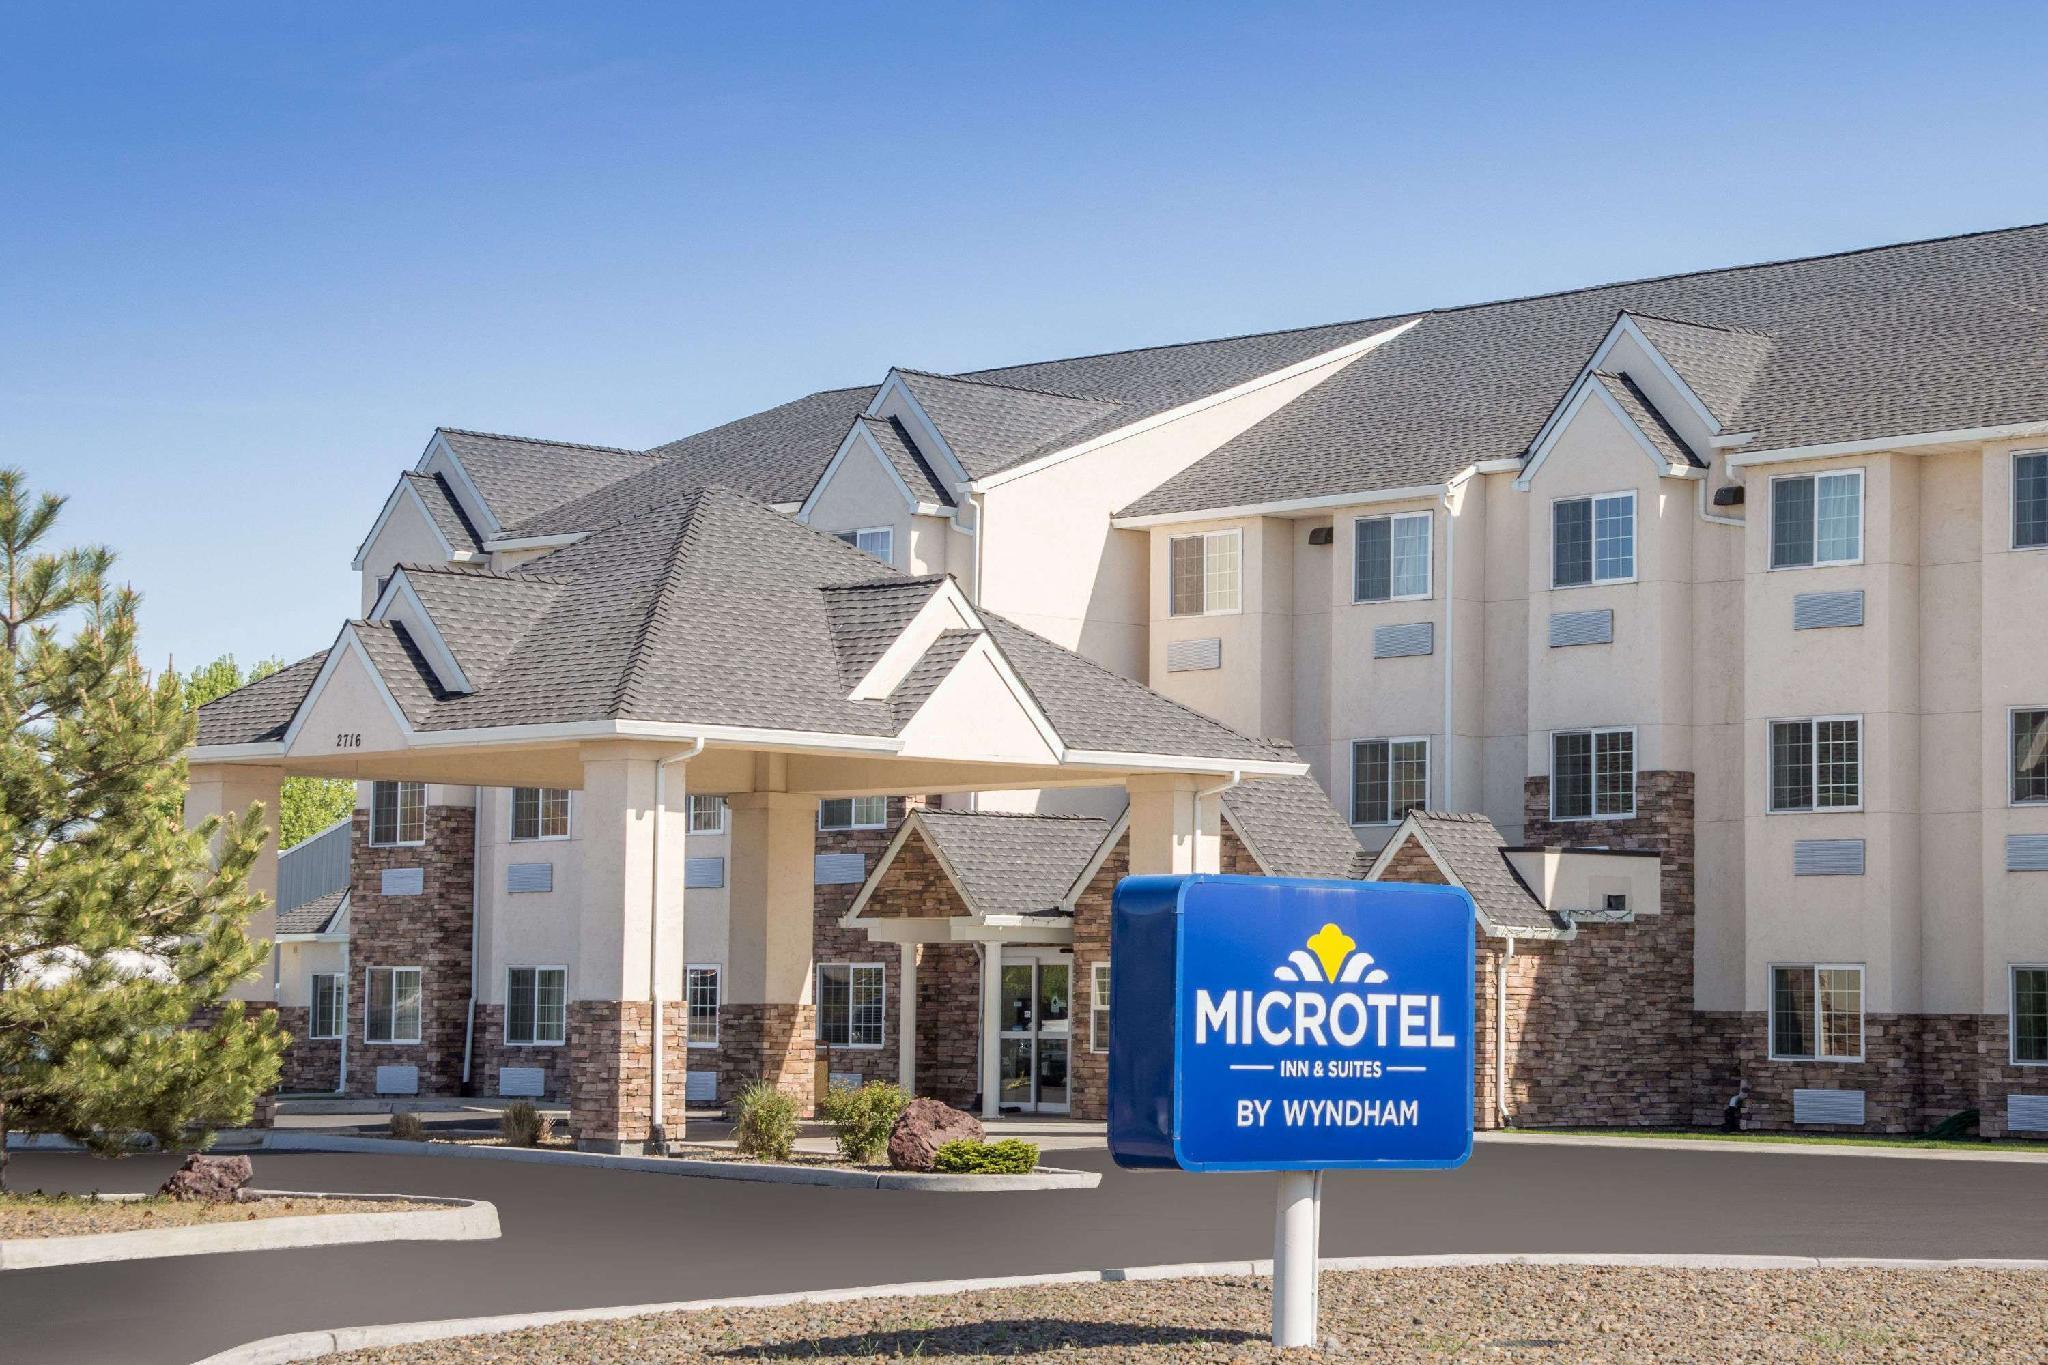 Microtel Inn And Suites By Wyndham Klamath Falls